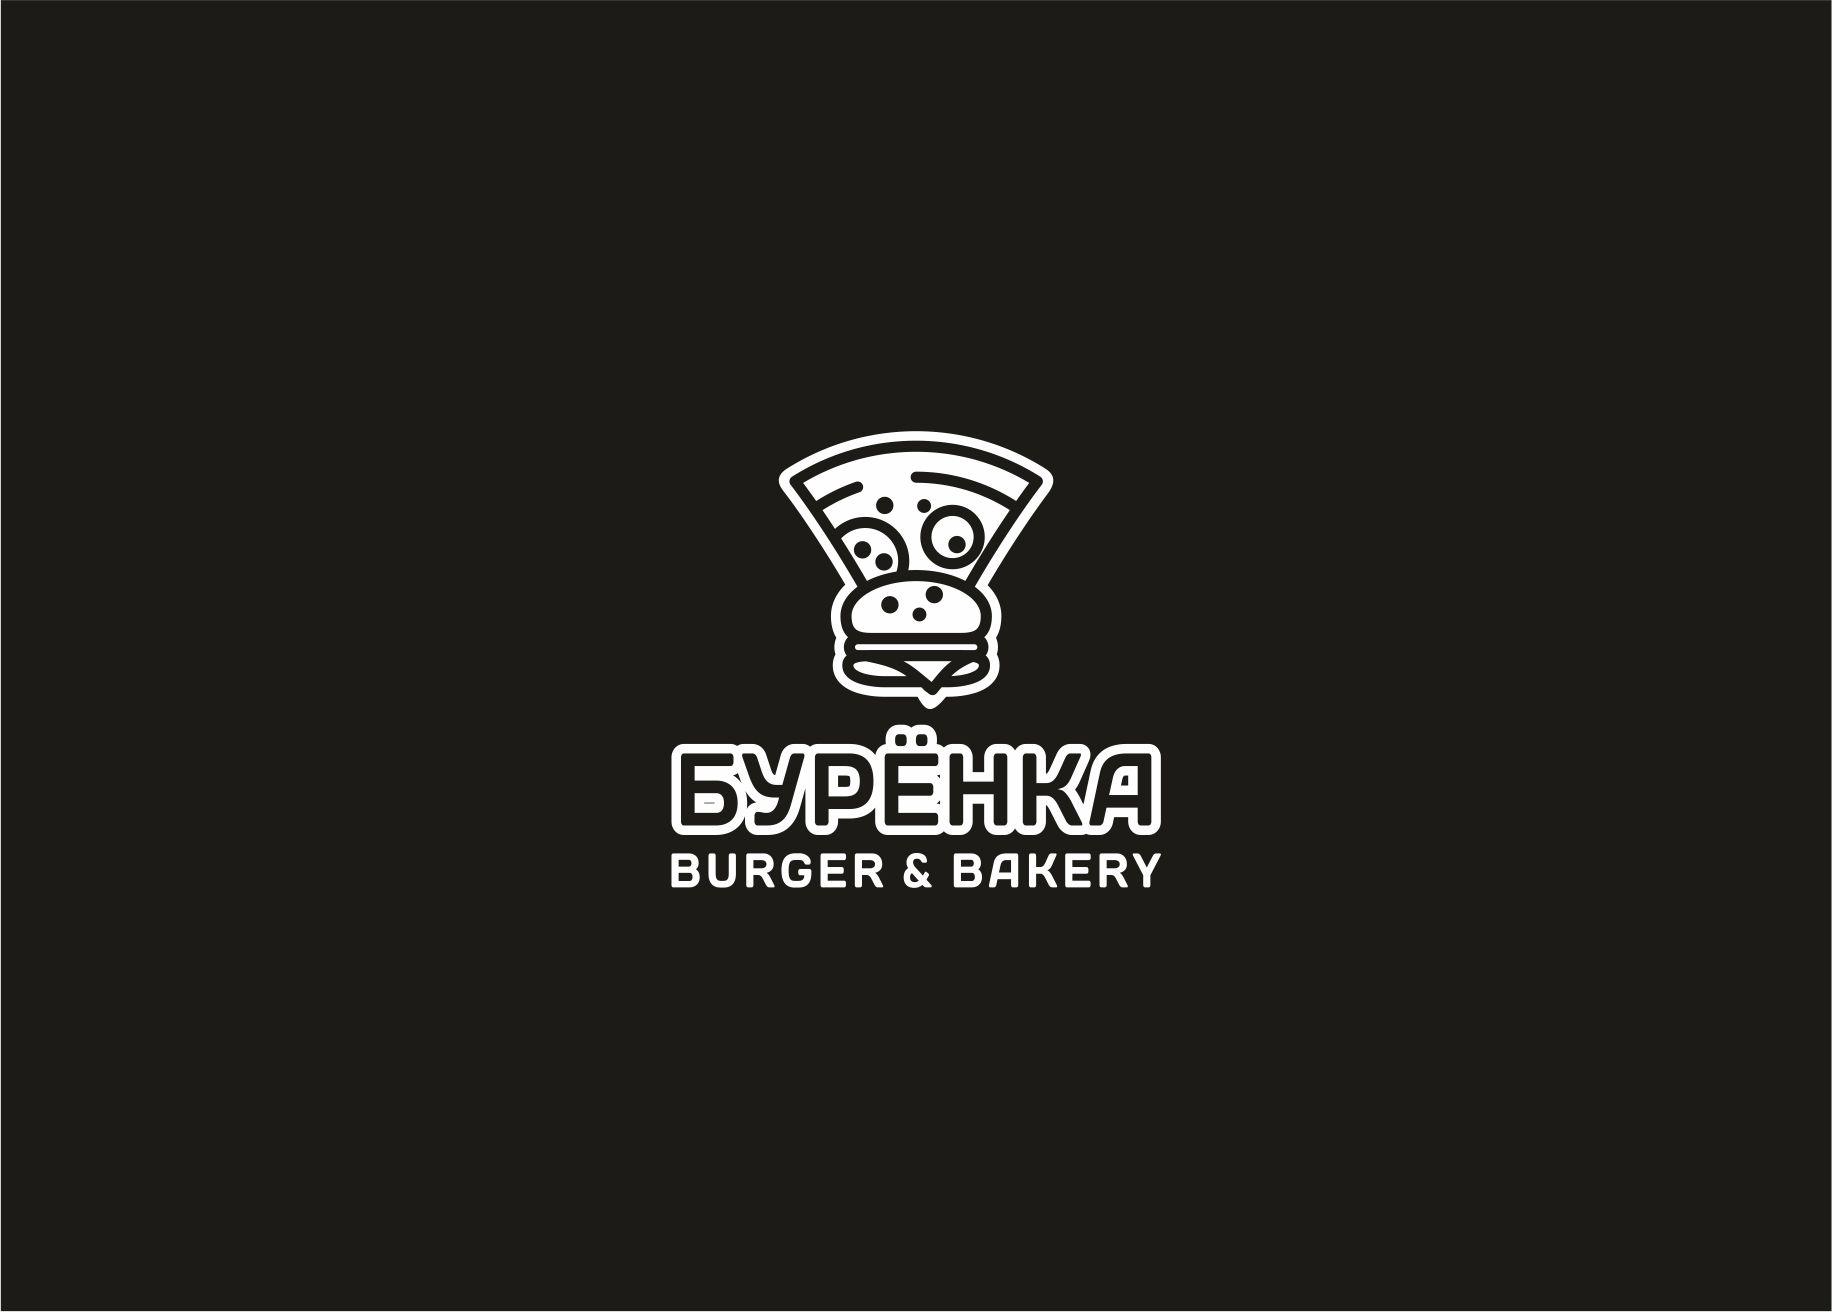 Логотип для Бургерной с Пекарней фото f_3665e10ce00d60ed.jpg